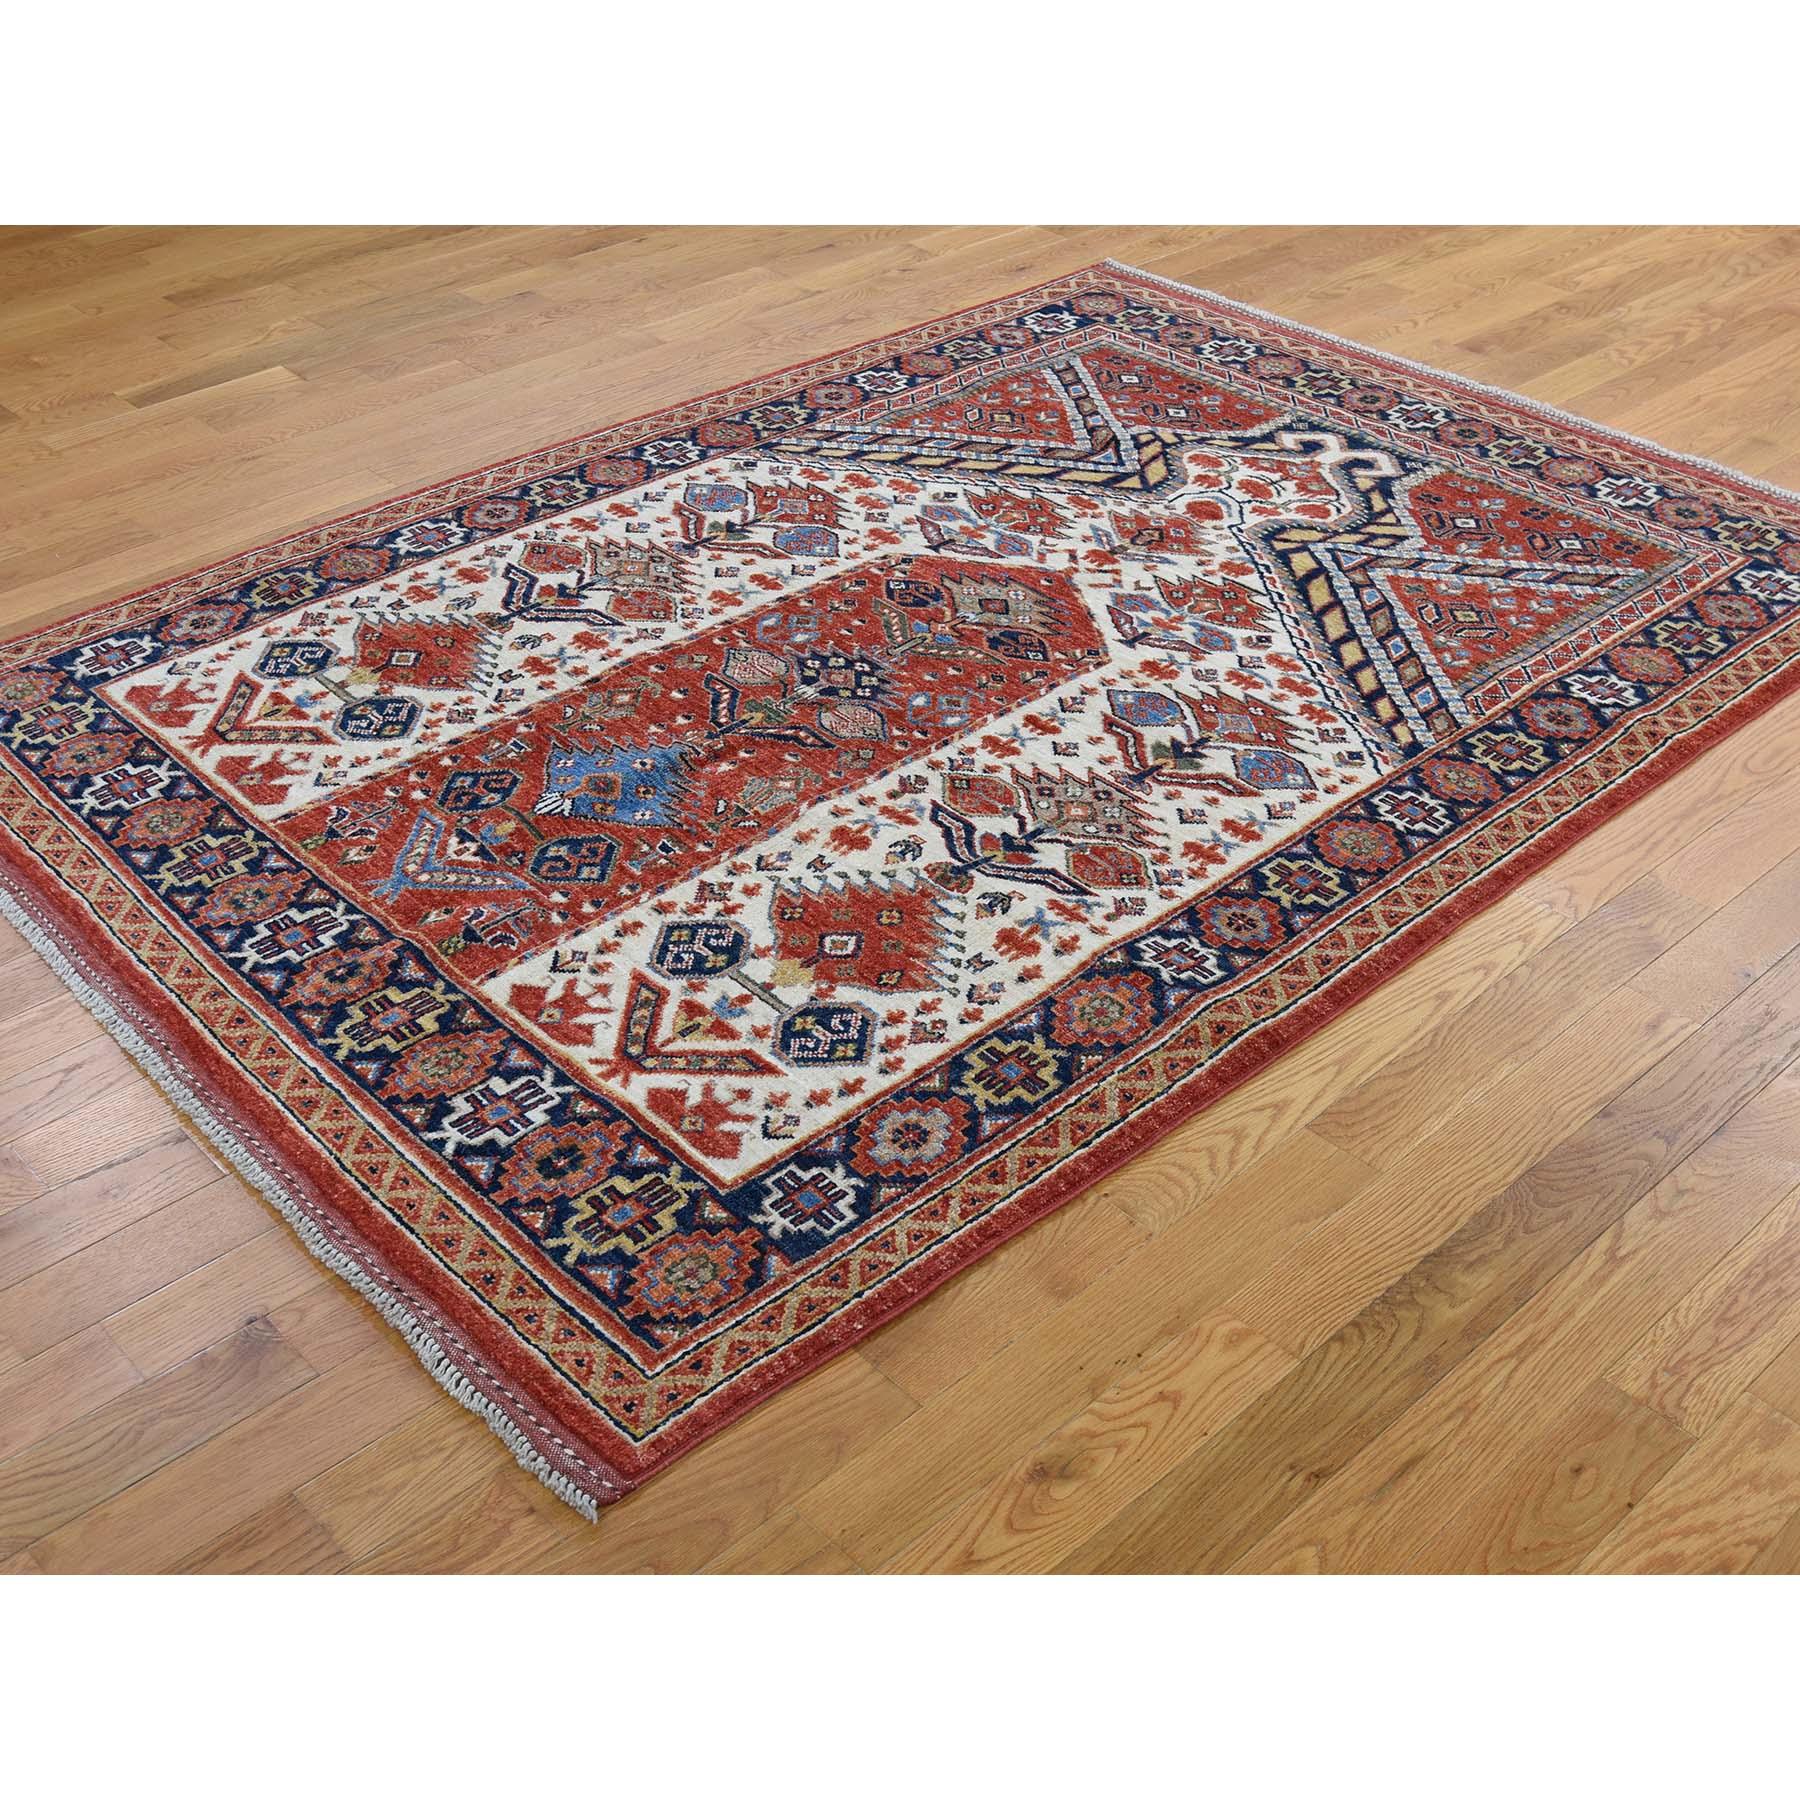 5-x7- Pure Wool Hand-Knotted Afghan Ersari Prayer Design Oriental Rug